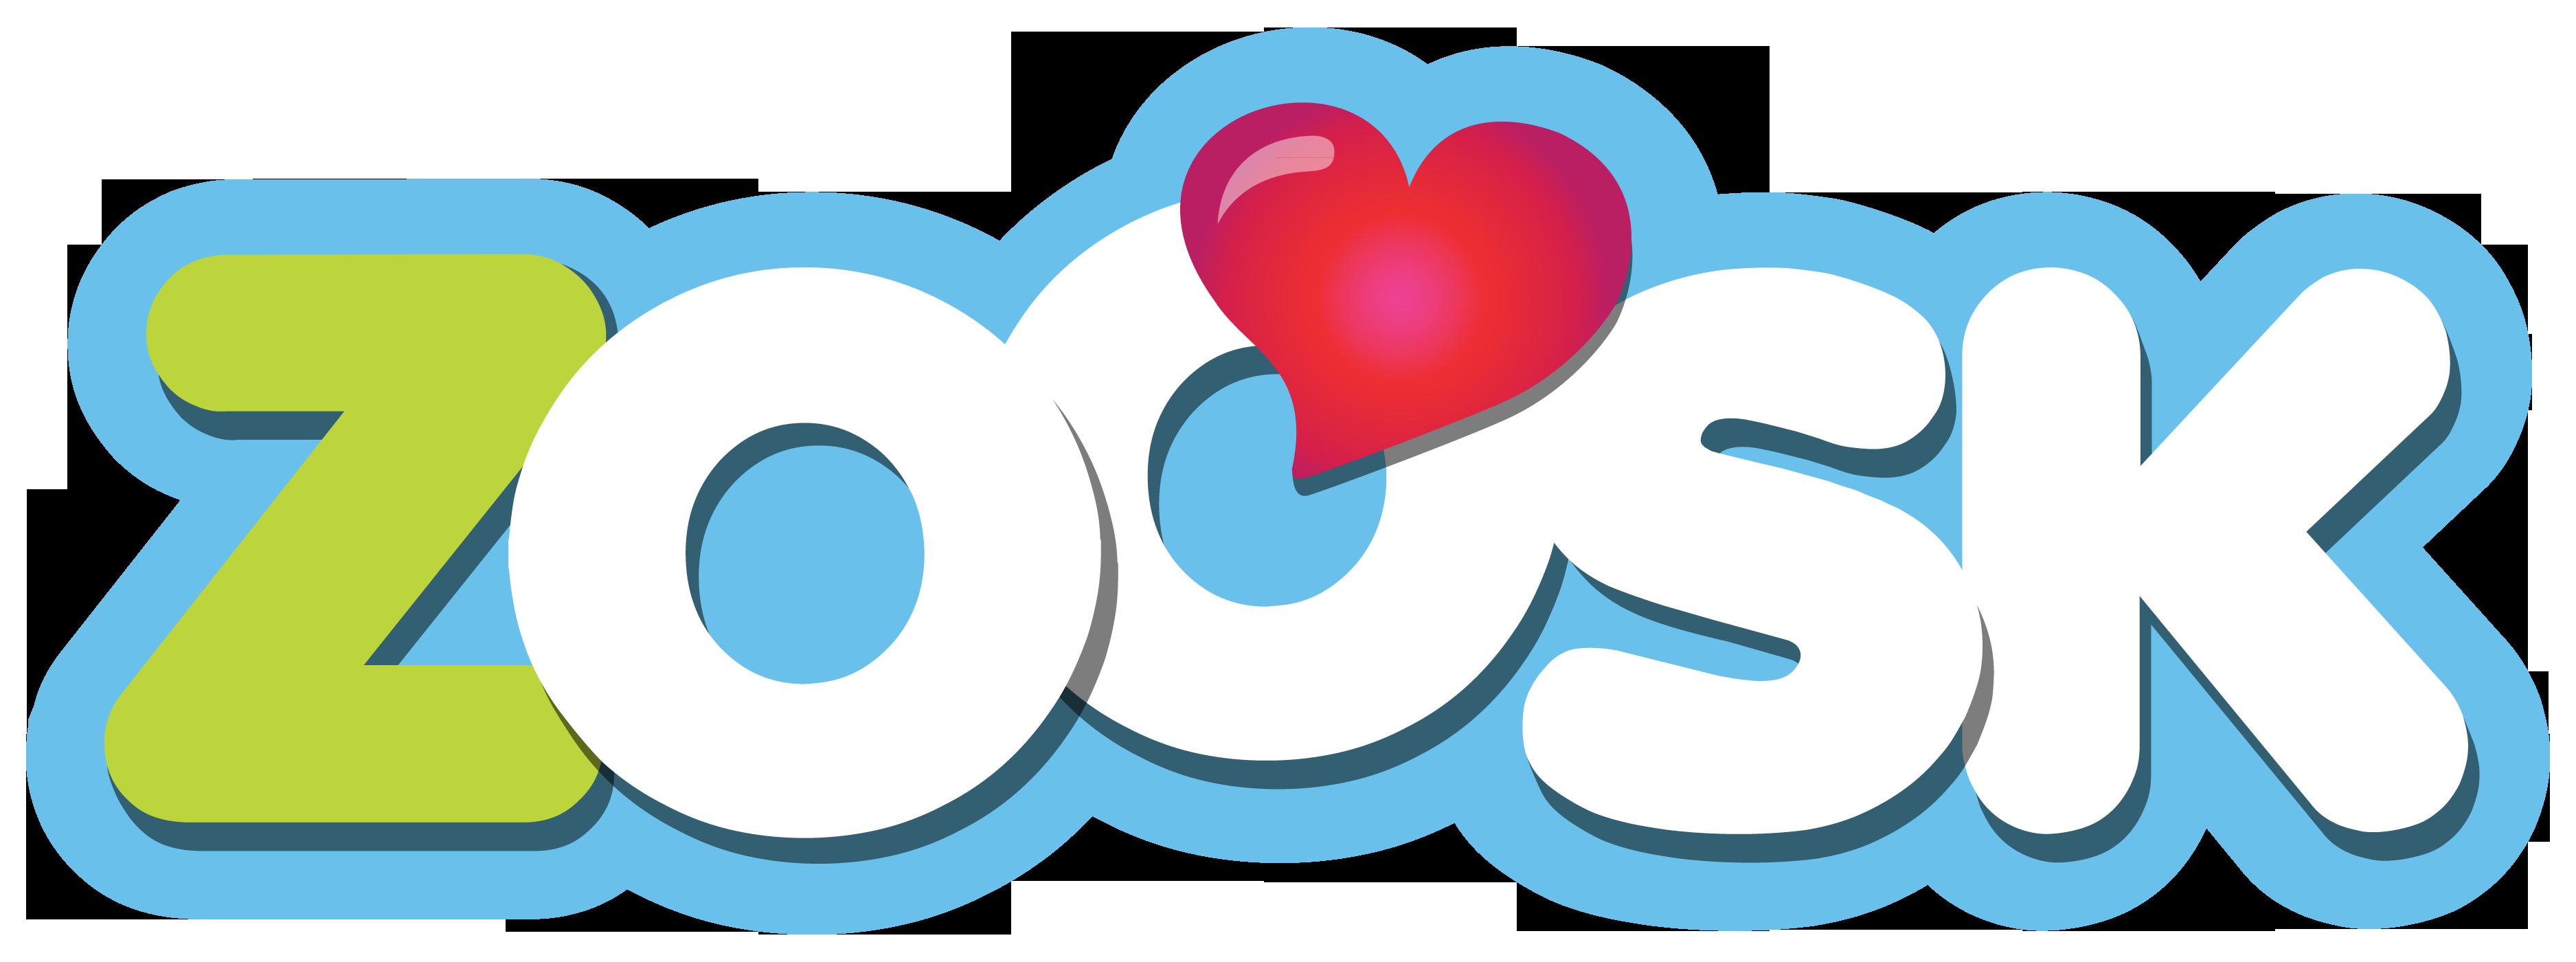 Zoosk support de rencontres en ligne